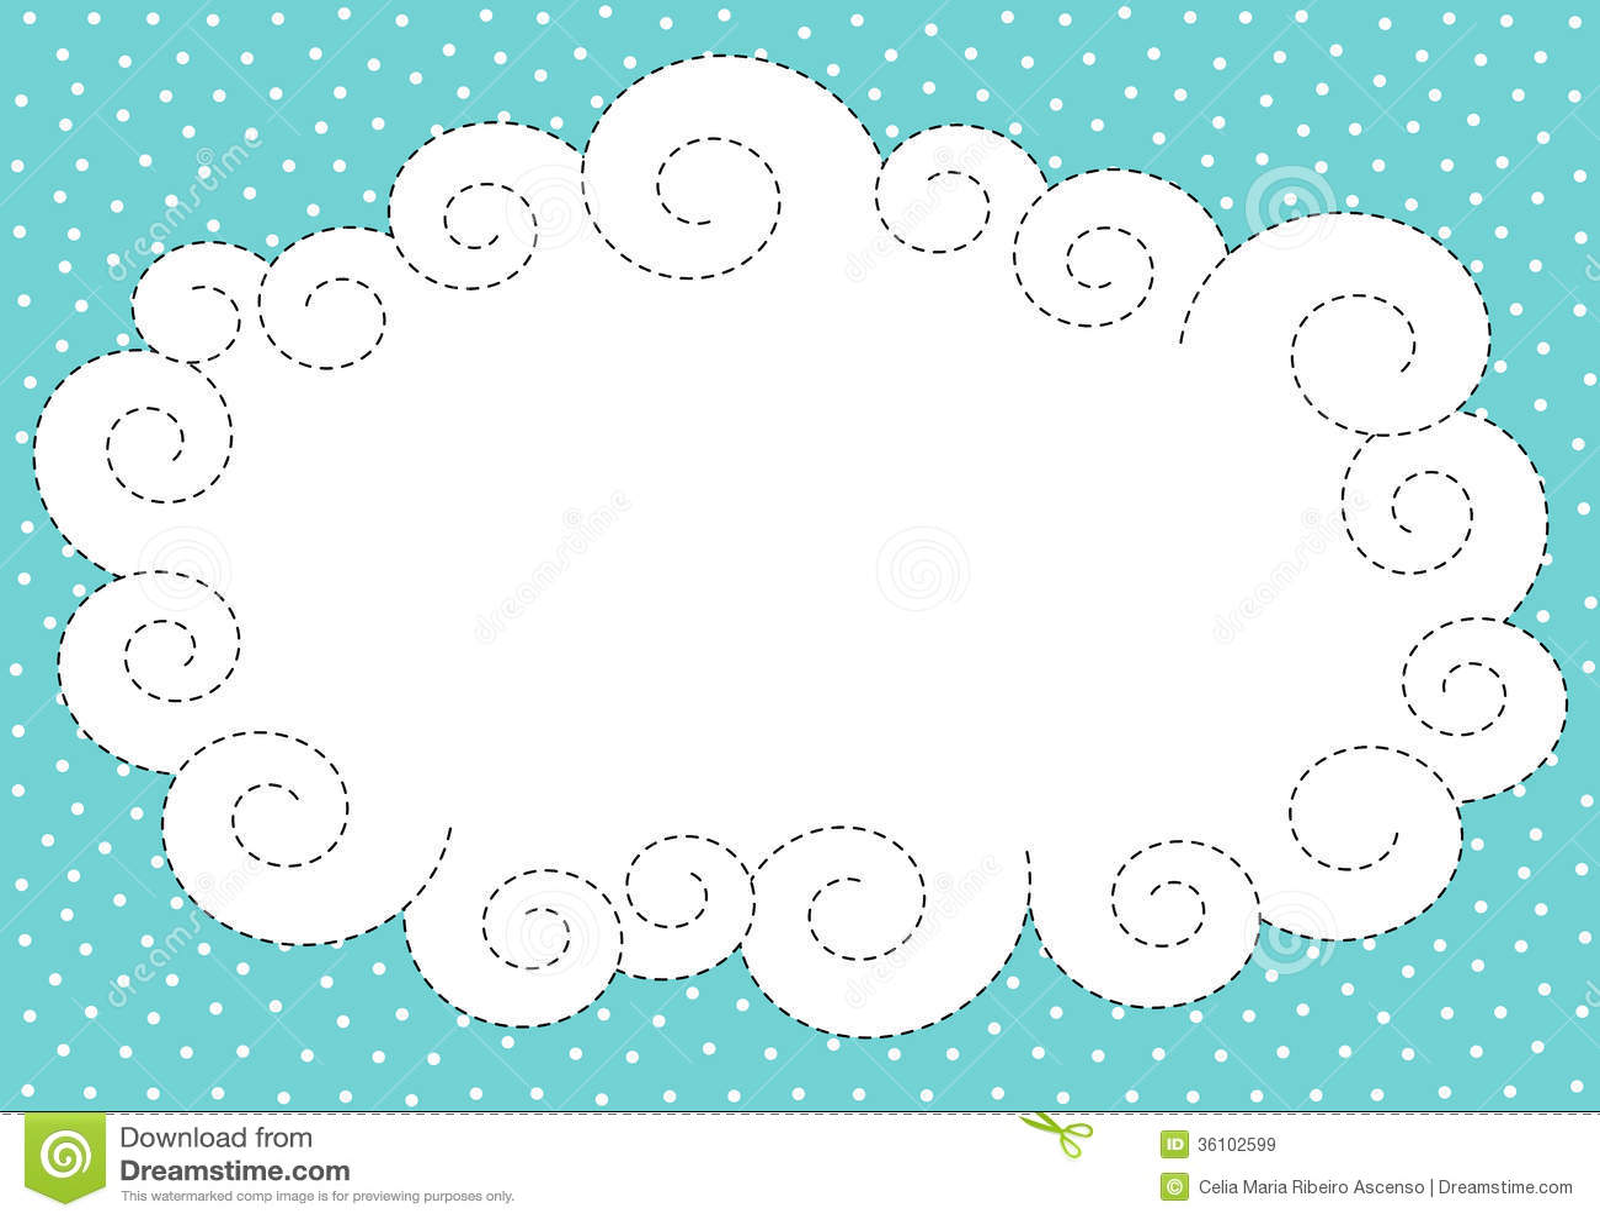 Cloud And Snow Border Frame Stock Illustration - Illustration of child, cloud: 36102599